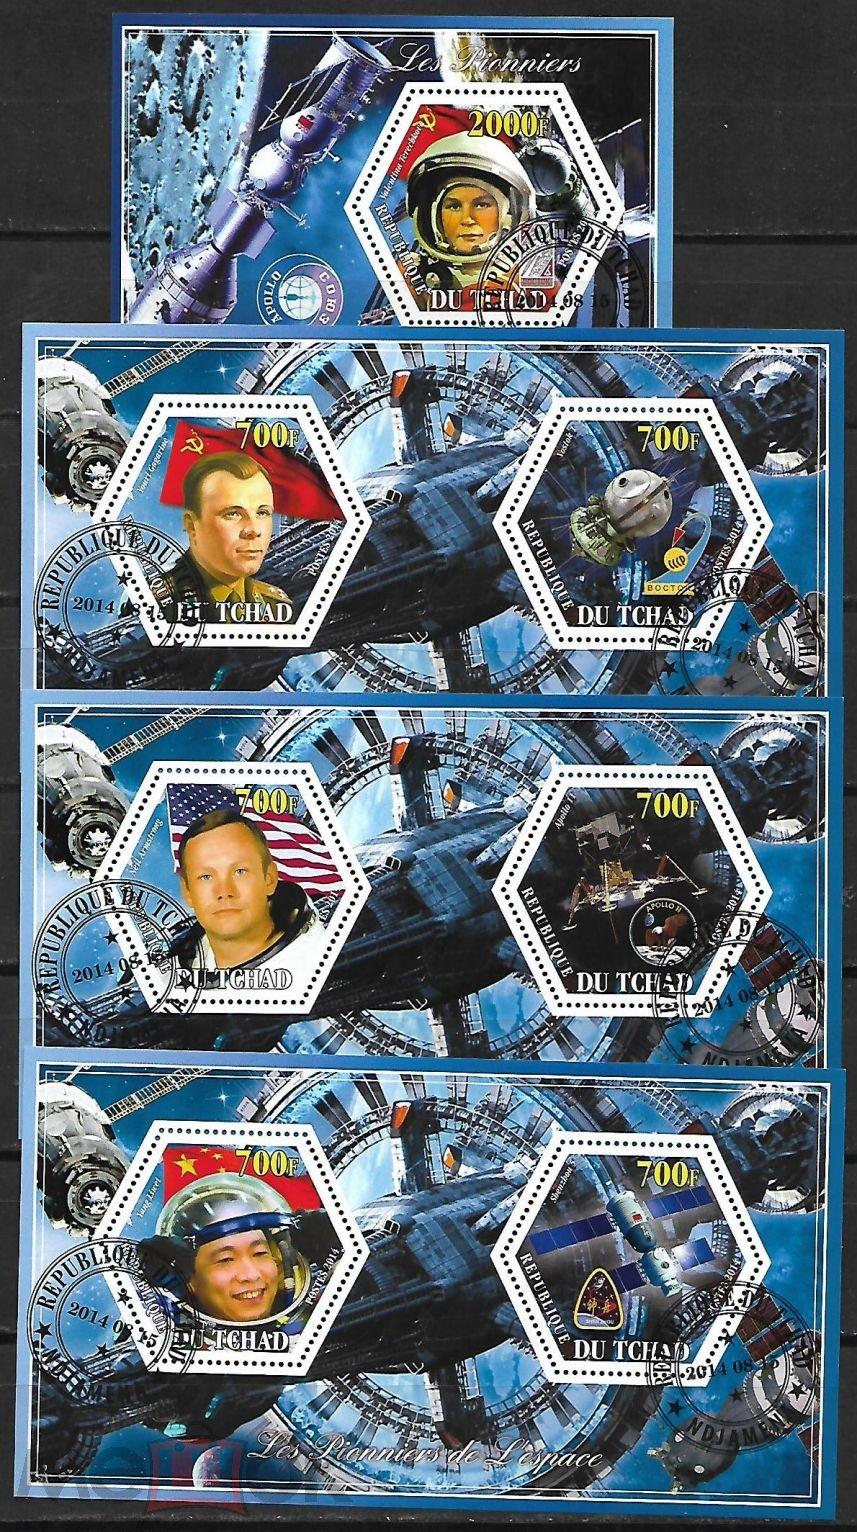 Космос Космонавты Ю.Гагарин,Армстронг,Терешкова Чад 2014 Гашеный блок+3 МЛ СТО